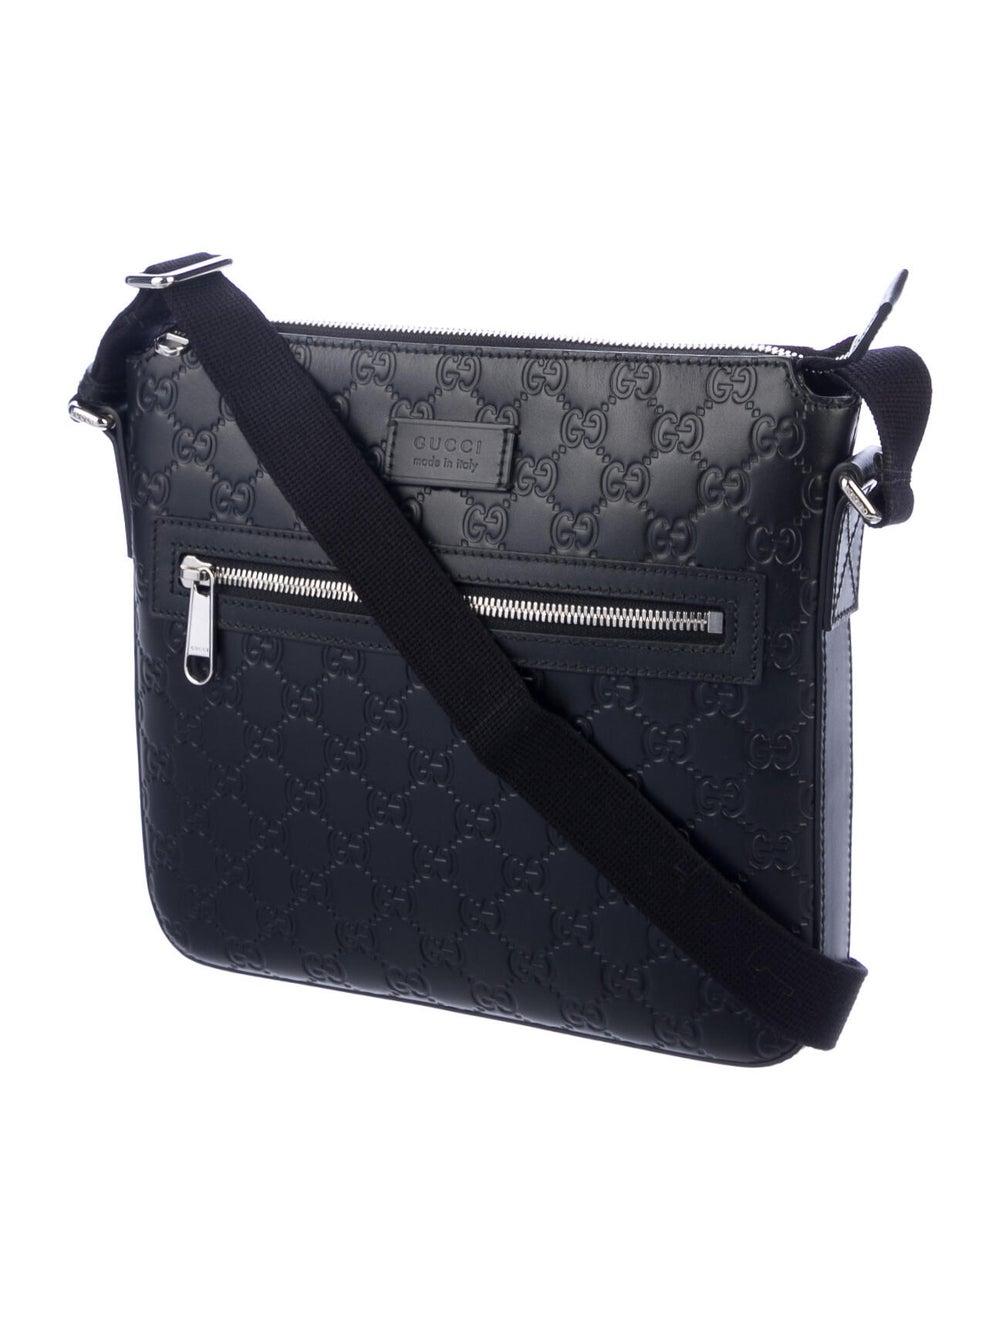 Gucci Signature Messenger Bag Black - image 3